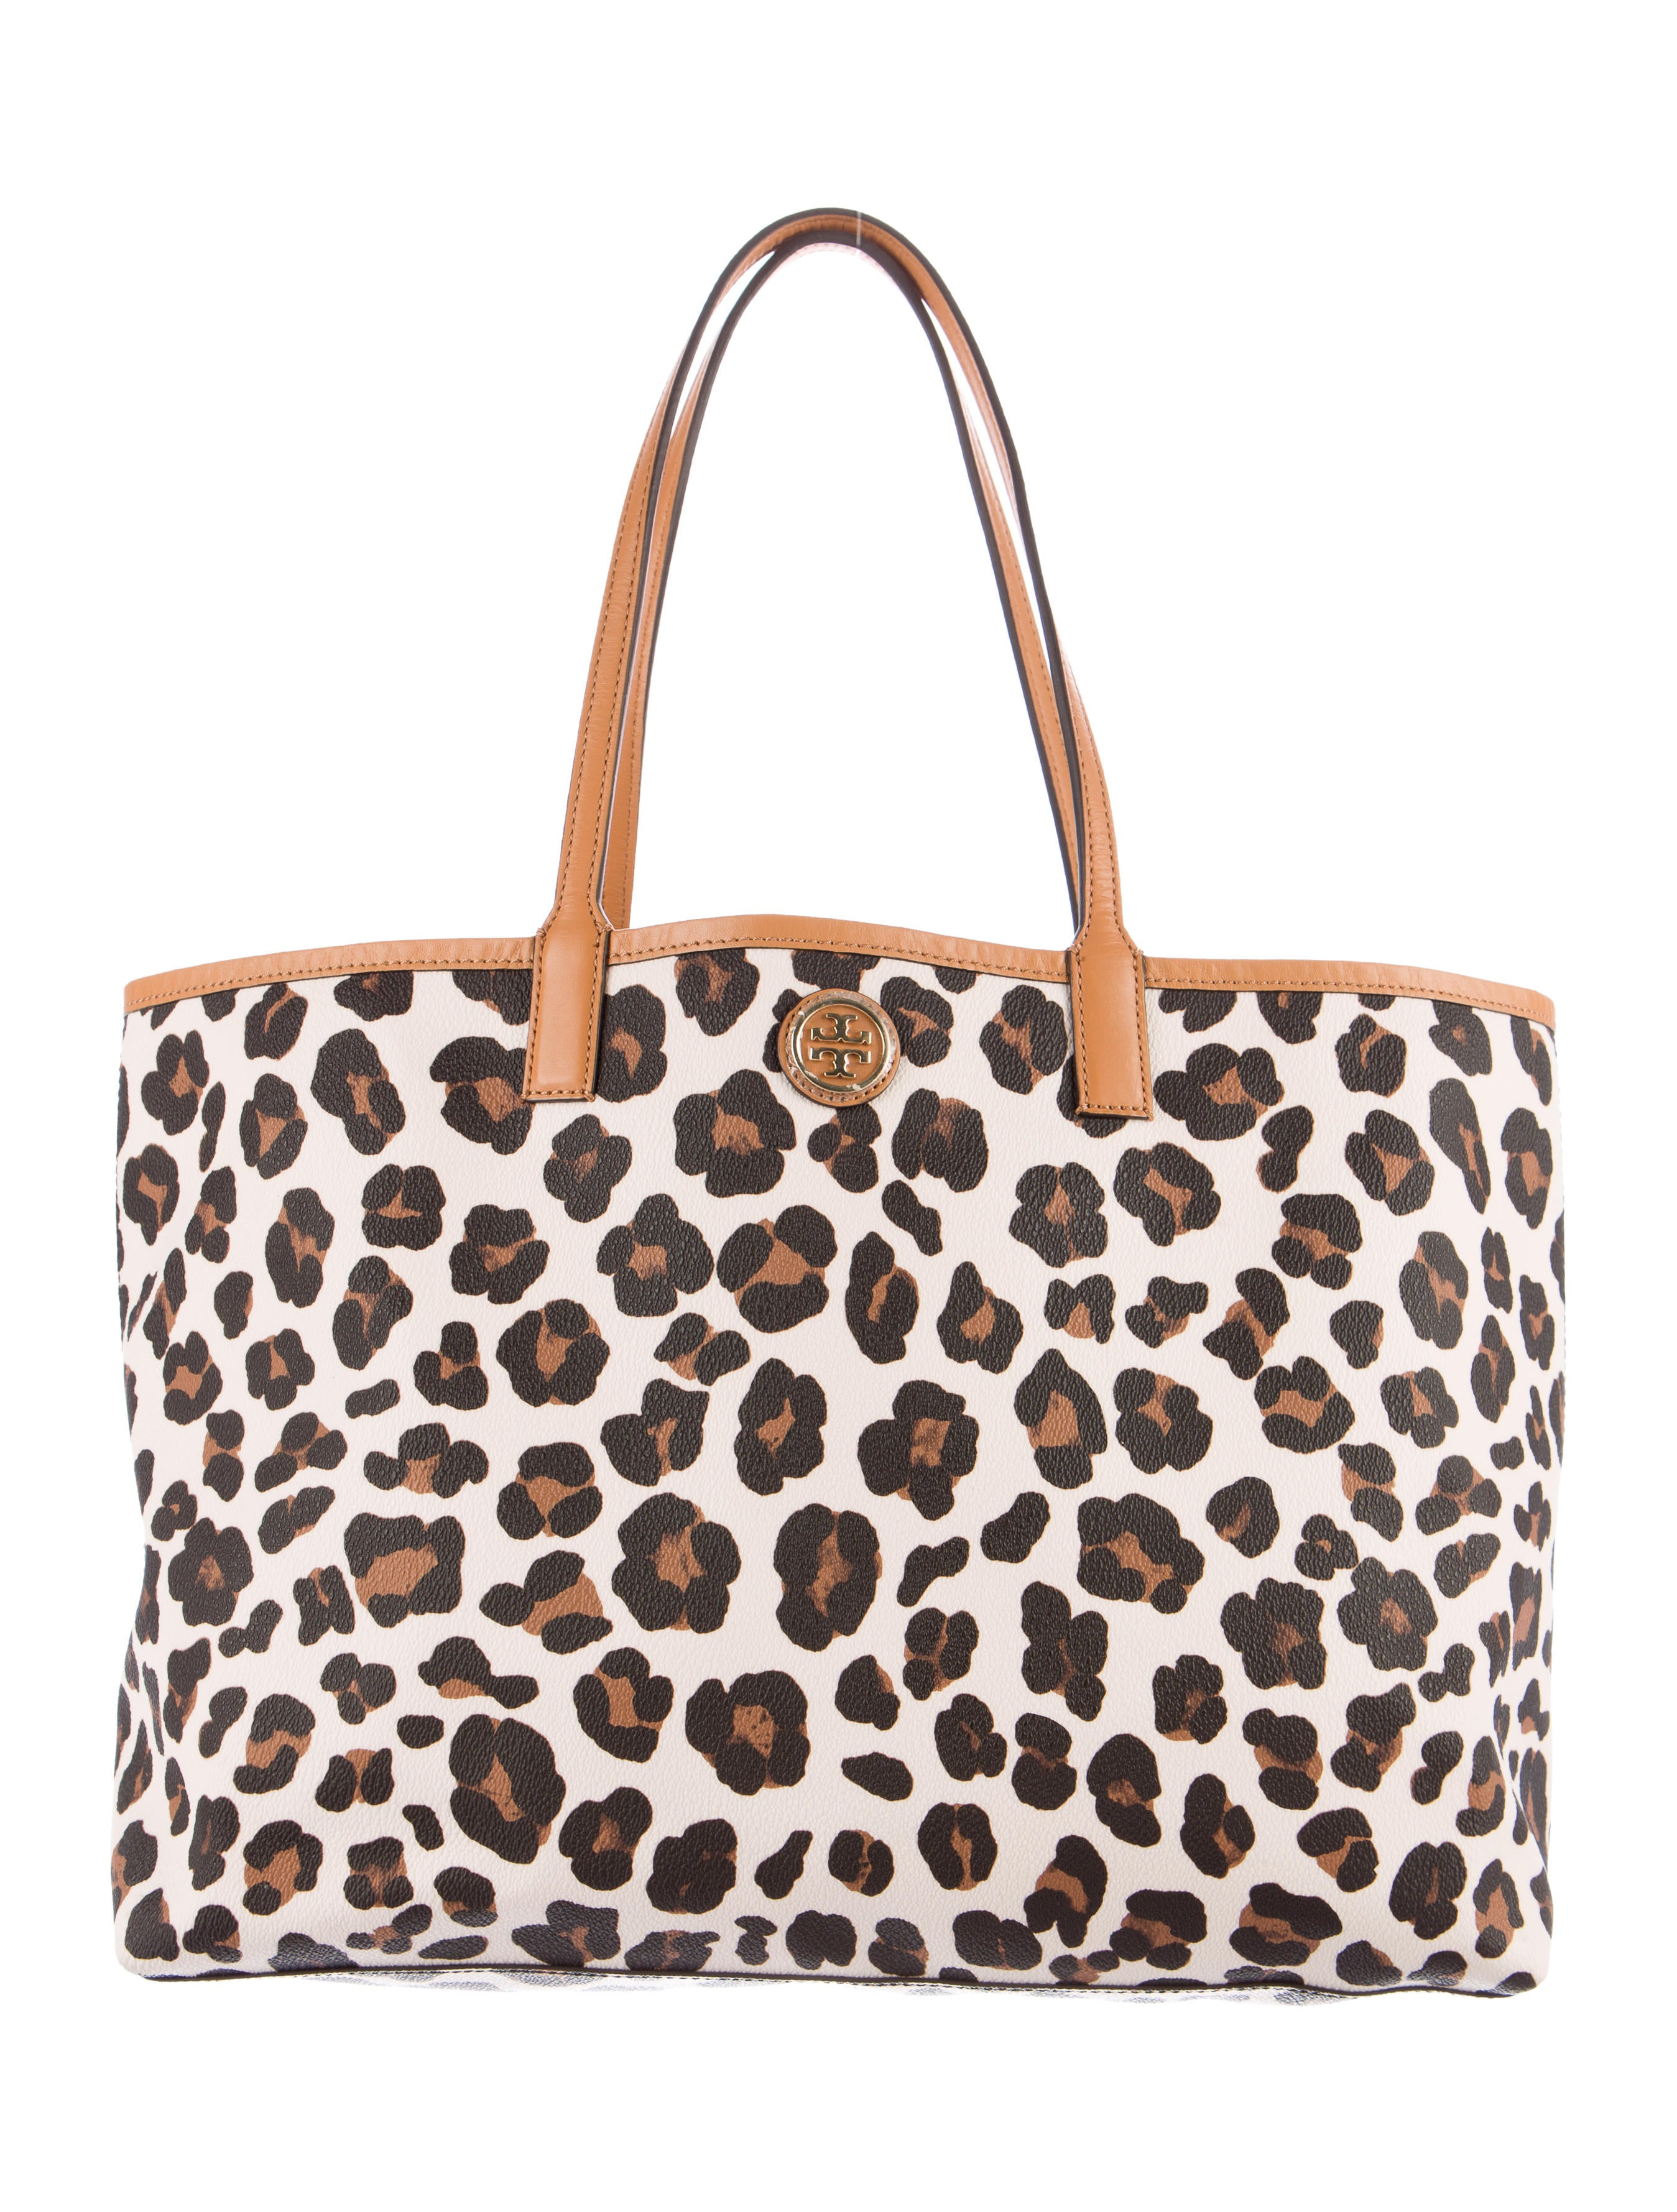 e81519cf0c97 Tory Burch Kerrington Leopard Print Tote - Handbags - WTO90211